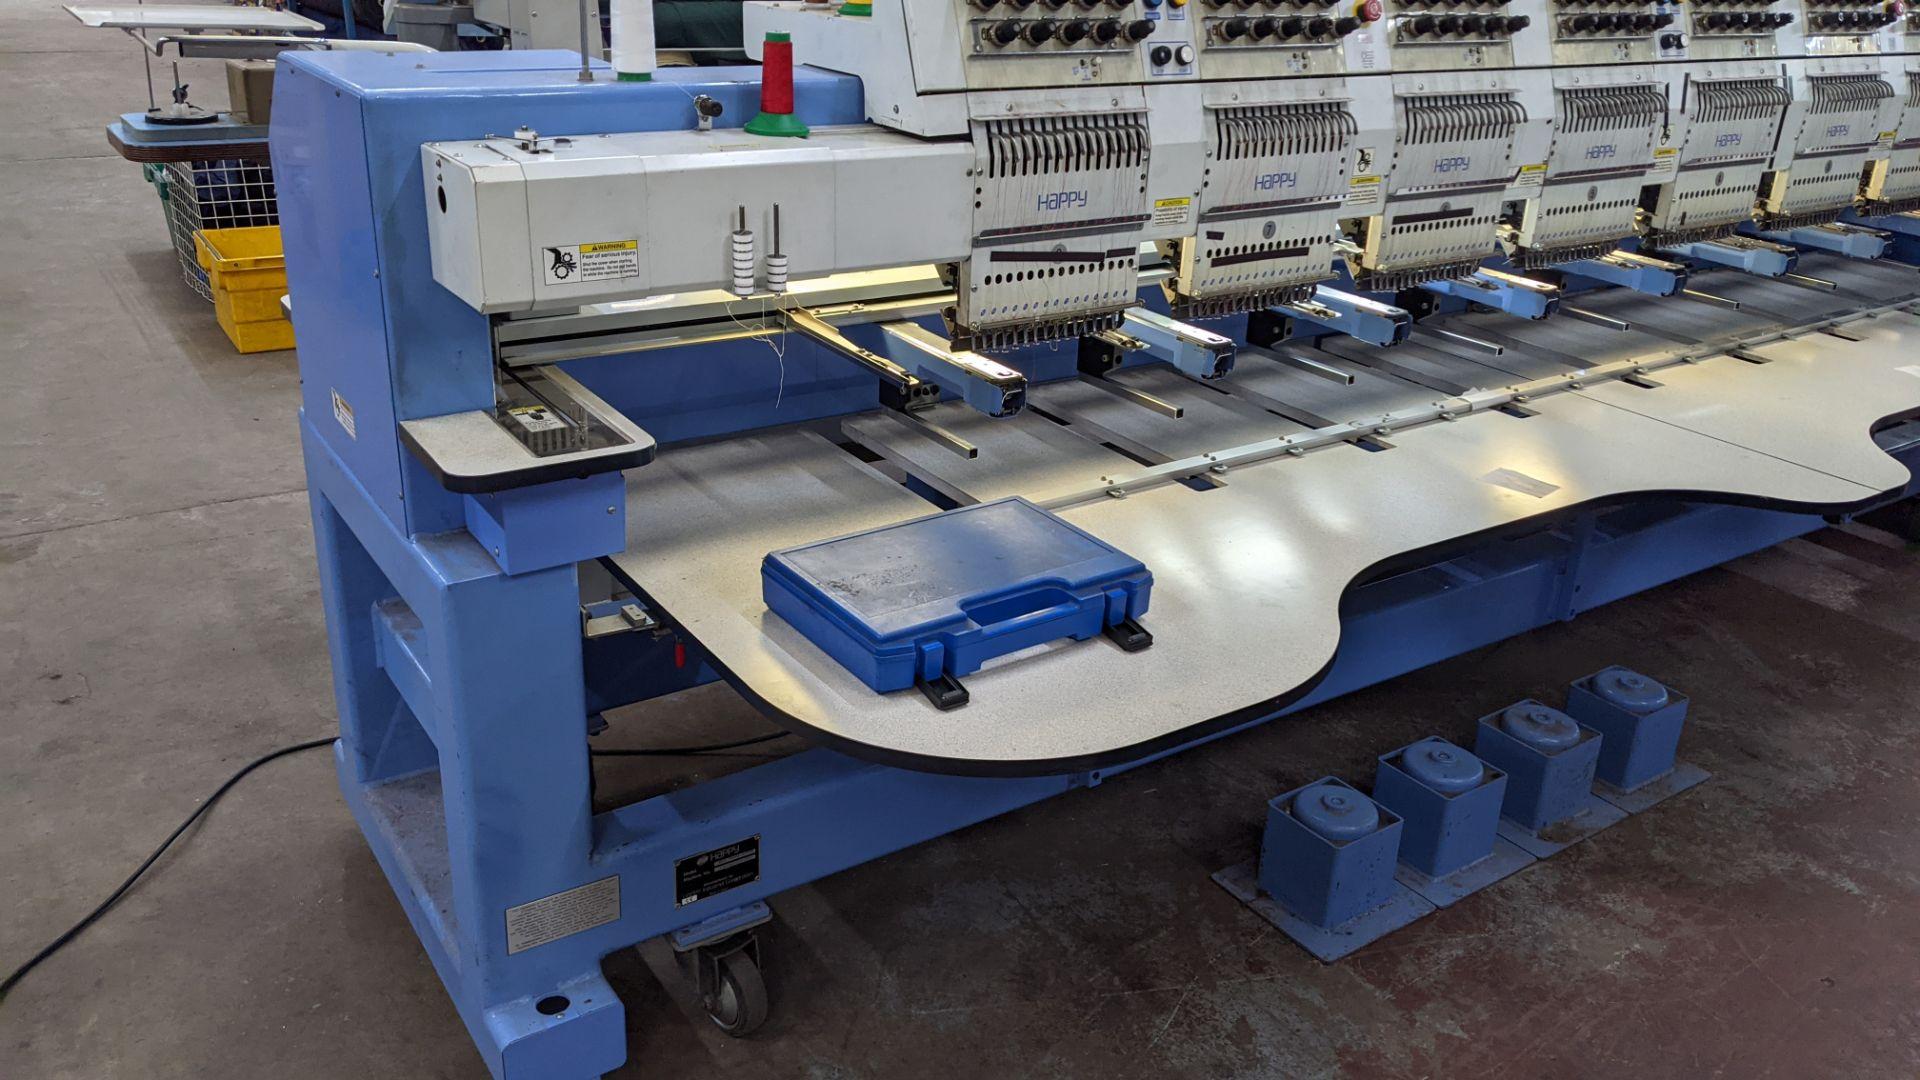 Happy 8 head embroidery machine, model HCG-1508B-45TTC, 15 needles per head, including frames & othe - Image 5 of 32